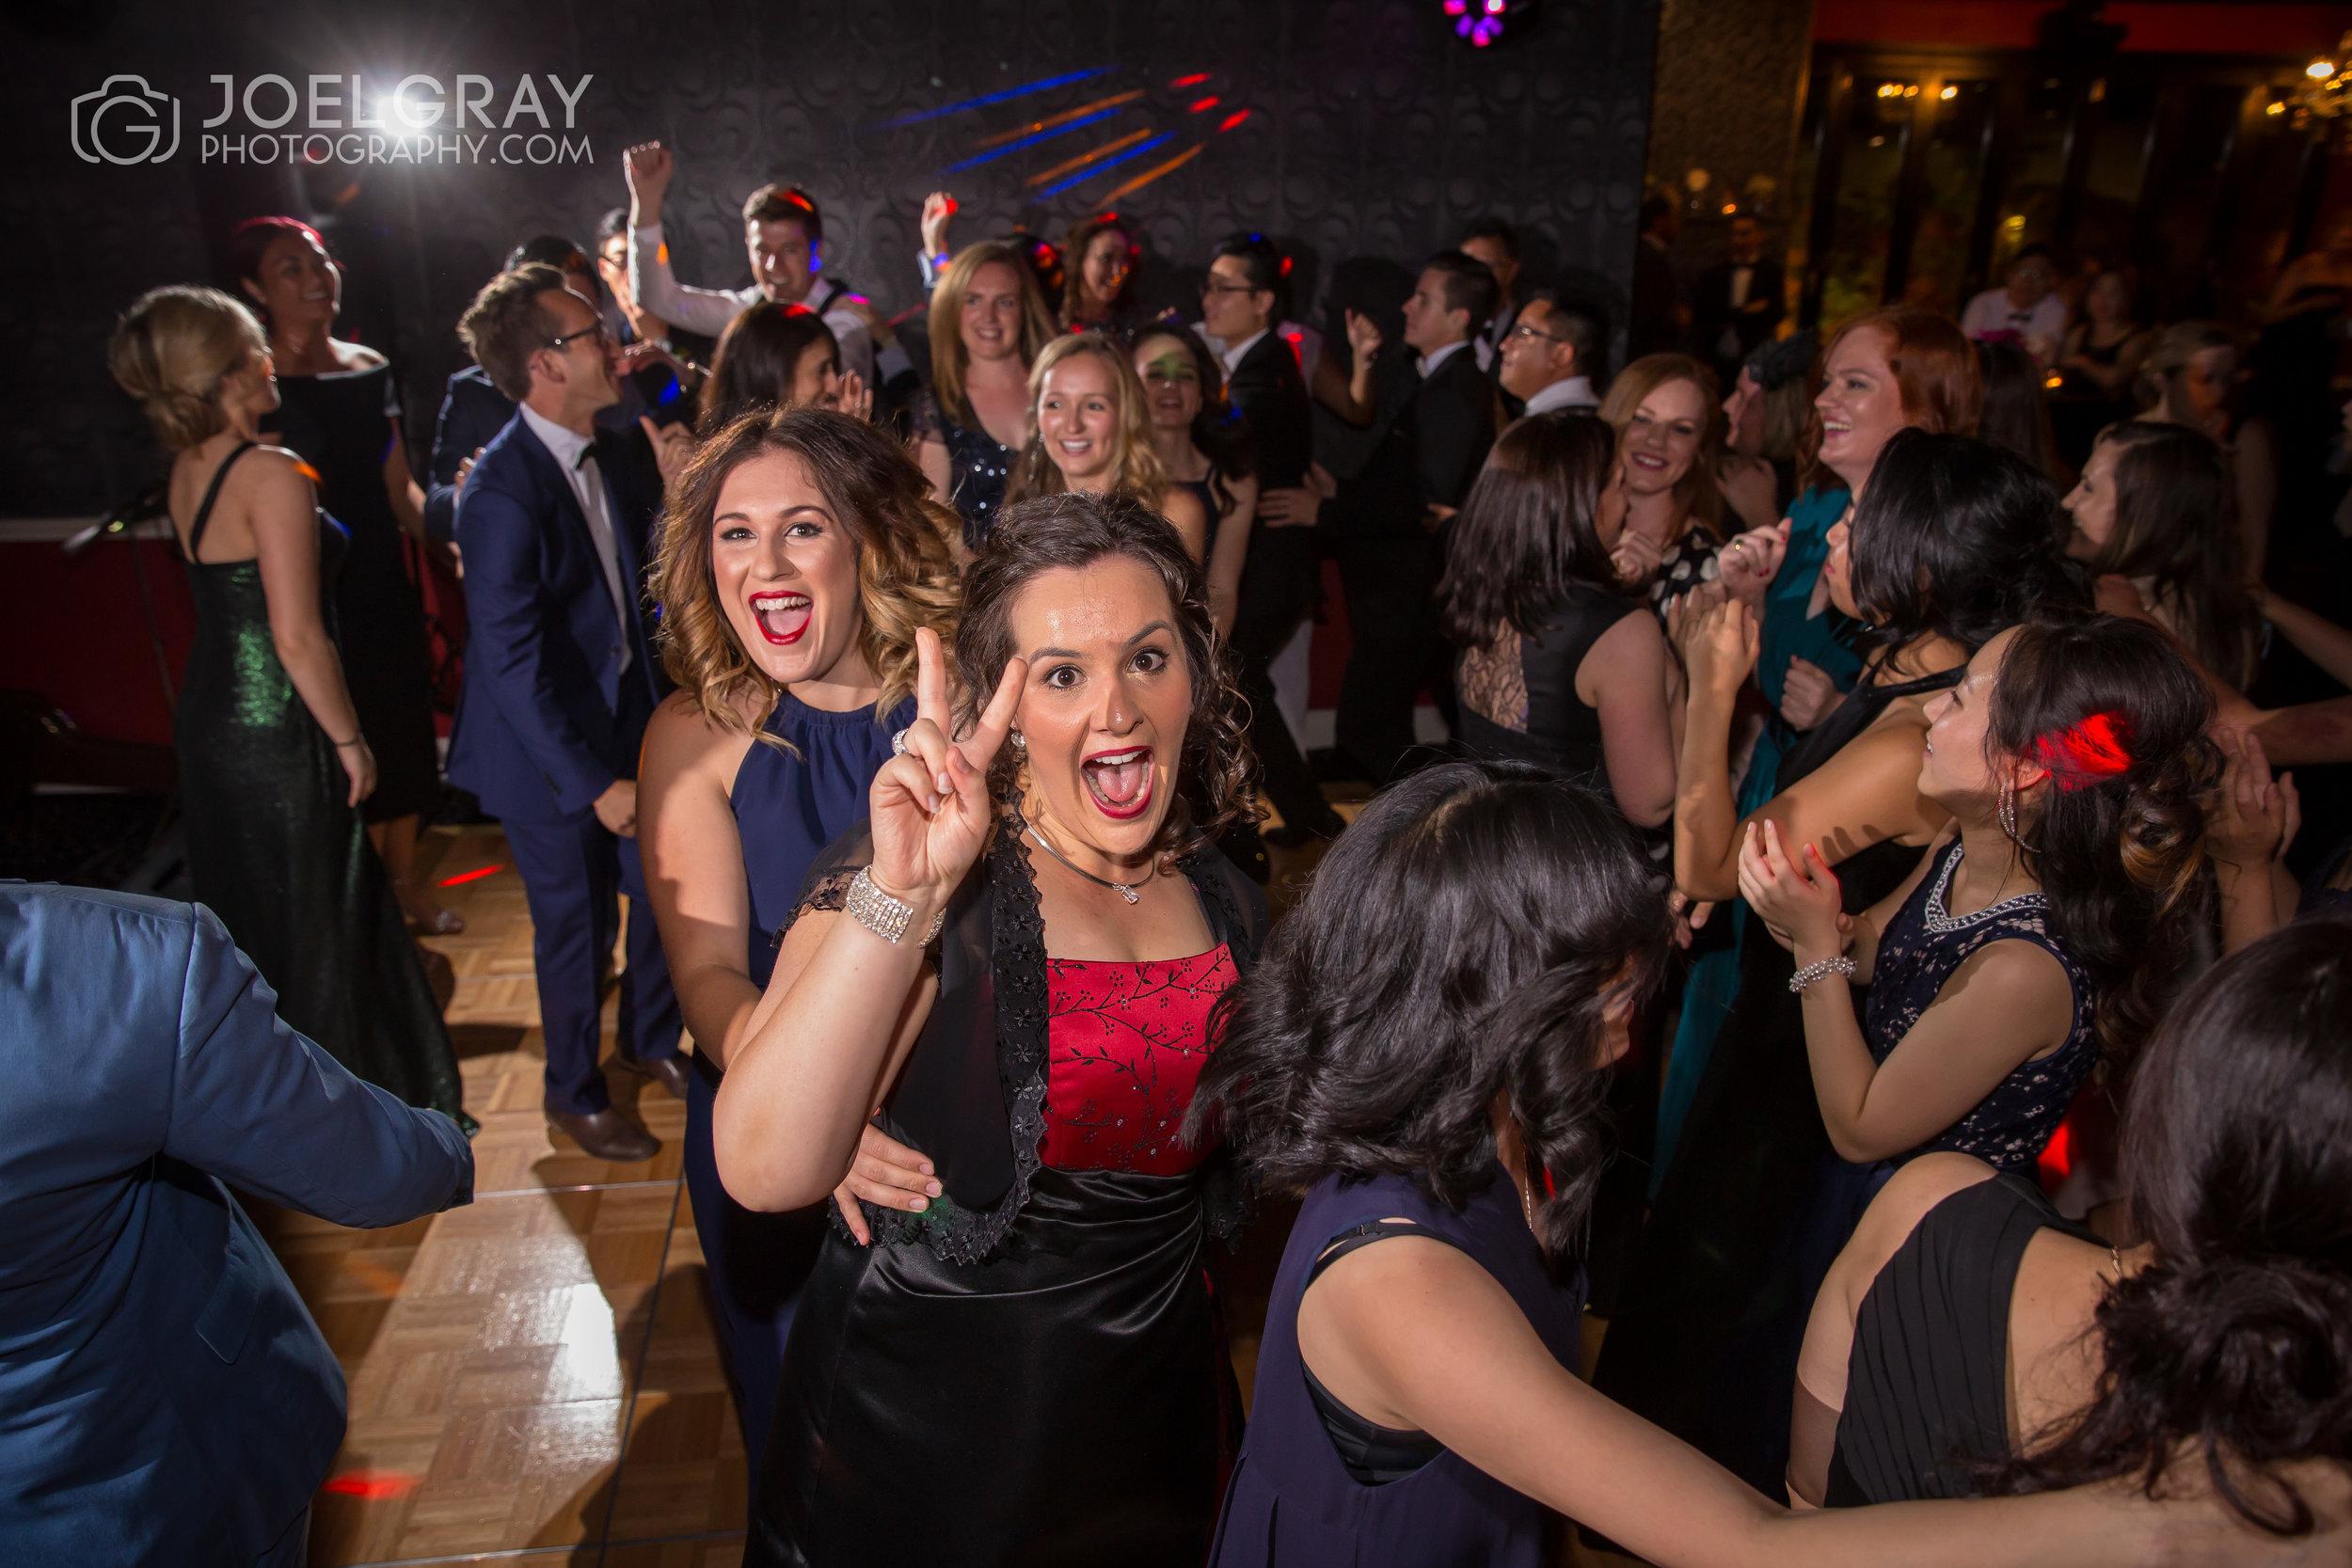 event-photos-lilys-events-photographer-sydney-1800829994